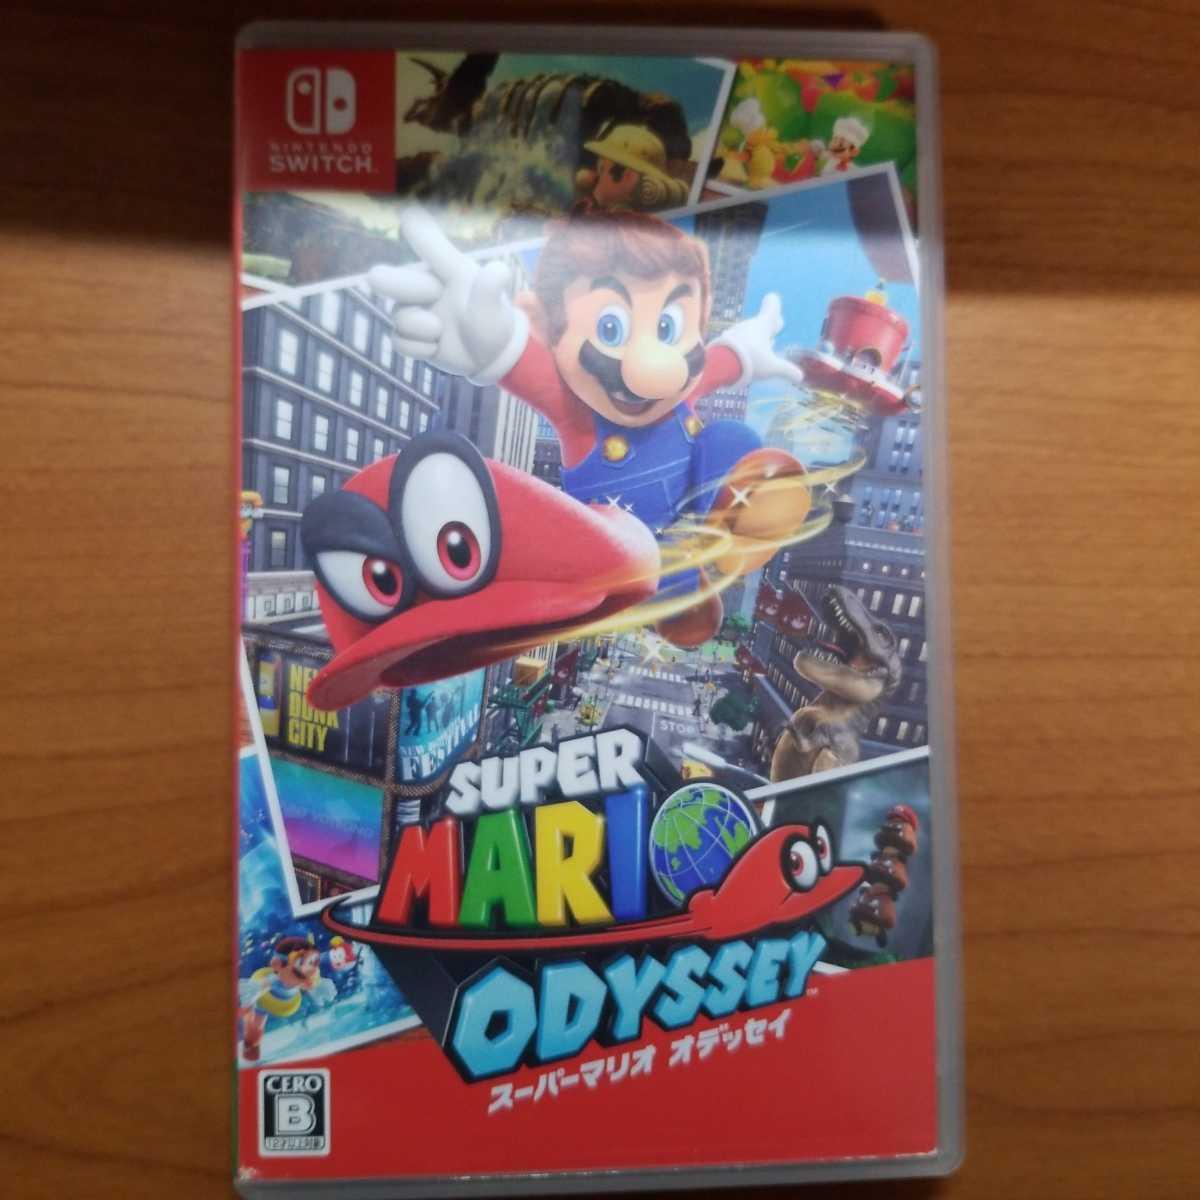 Switch スーパーマリオオデッセイ Nintendo Switch スーパーマリオ オデッセイ ニンテンドースイッチ ソフト 送料無料 ⑦